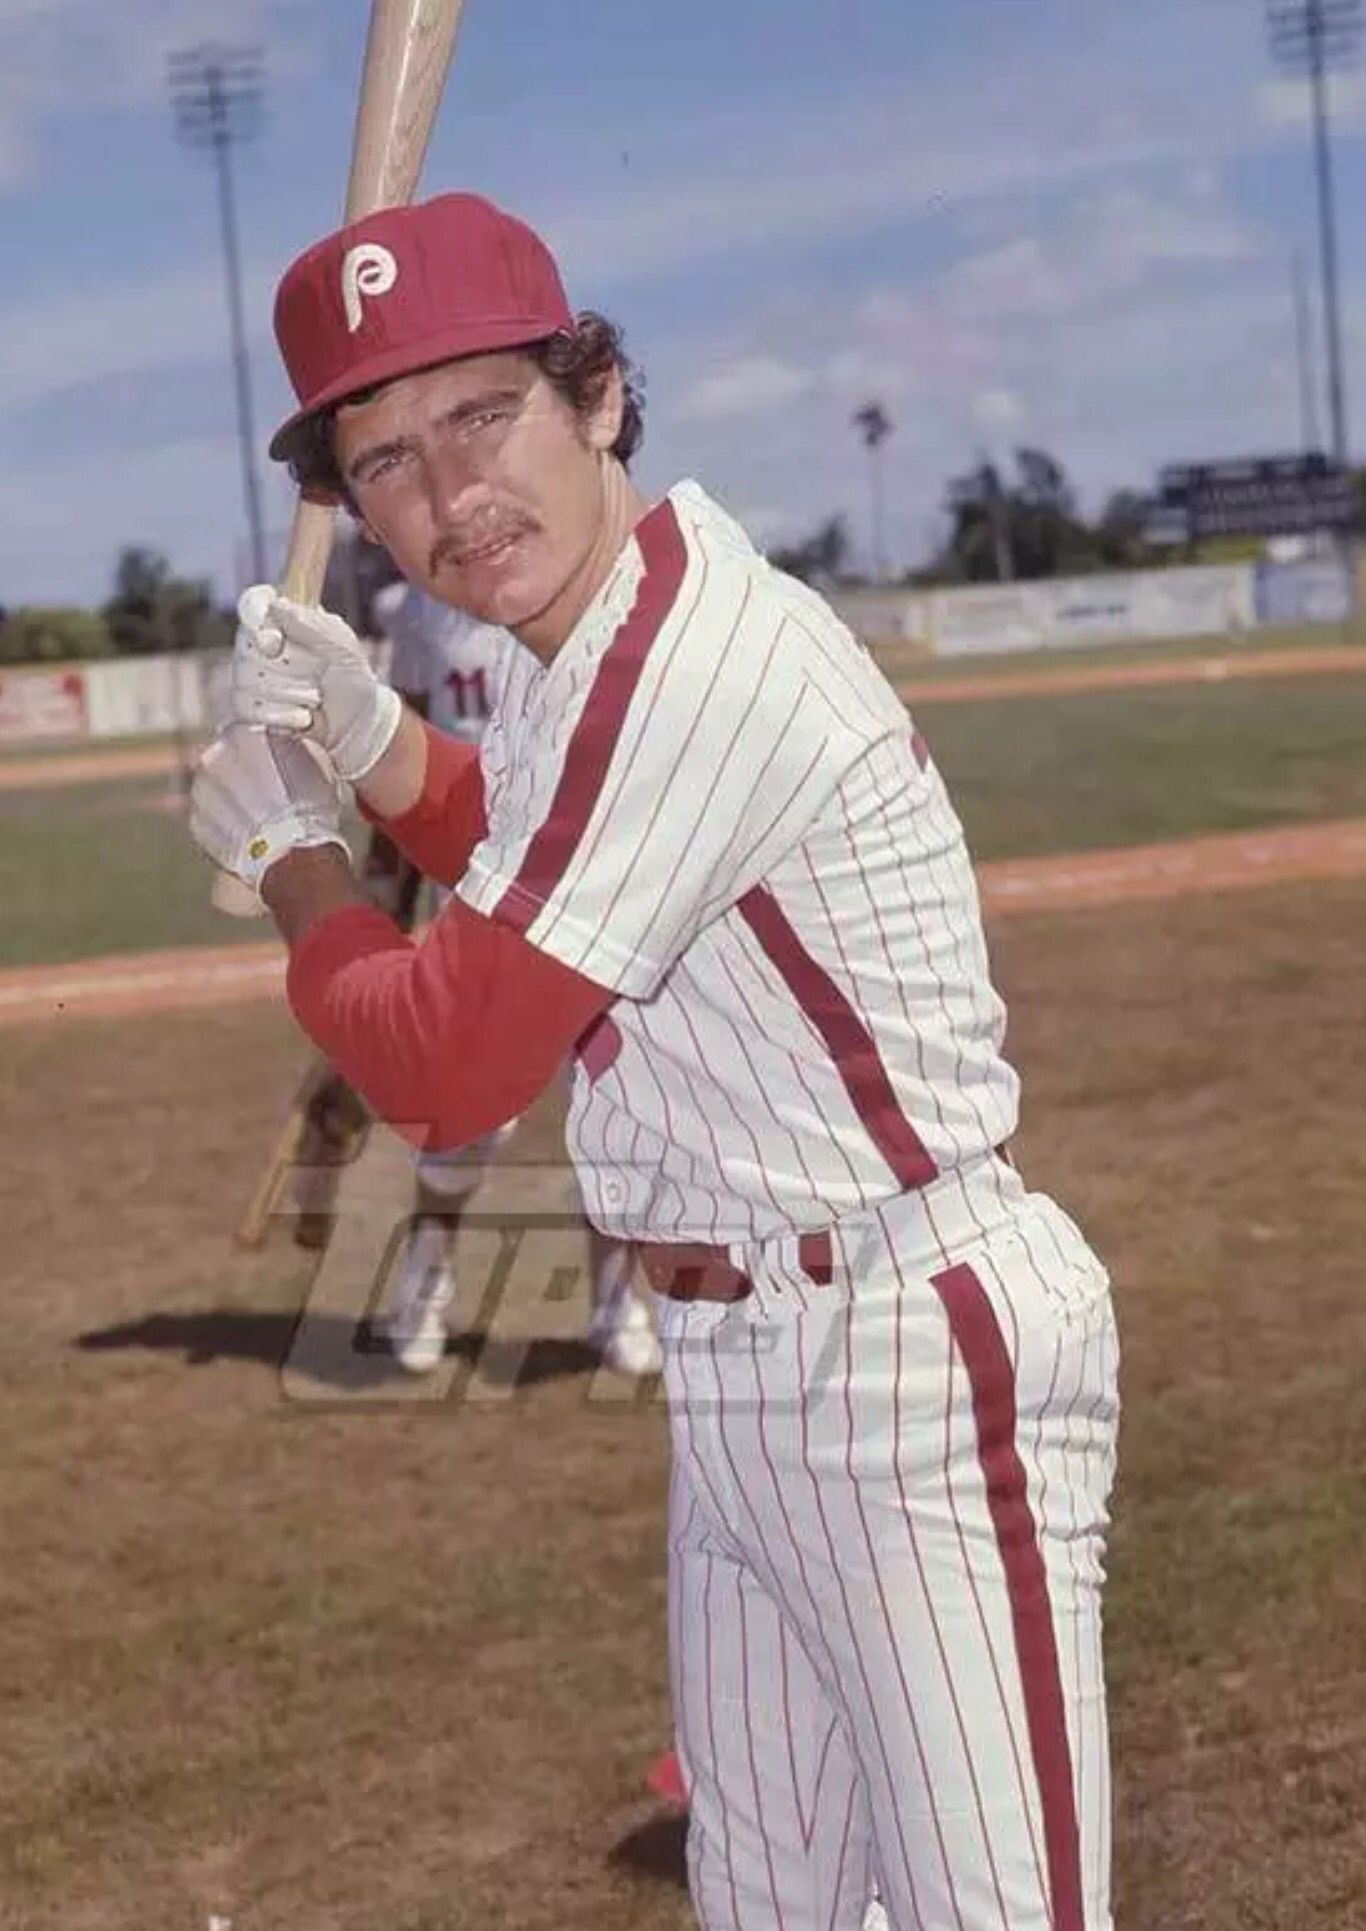 Larry Bowa | Philadelphia phillies, Phillies, Baseball photos